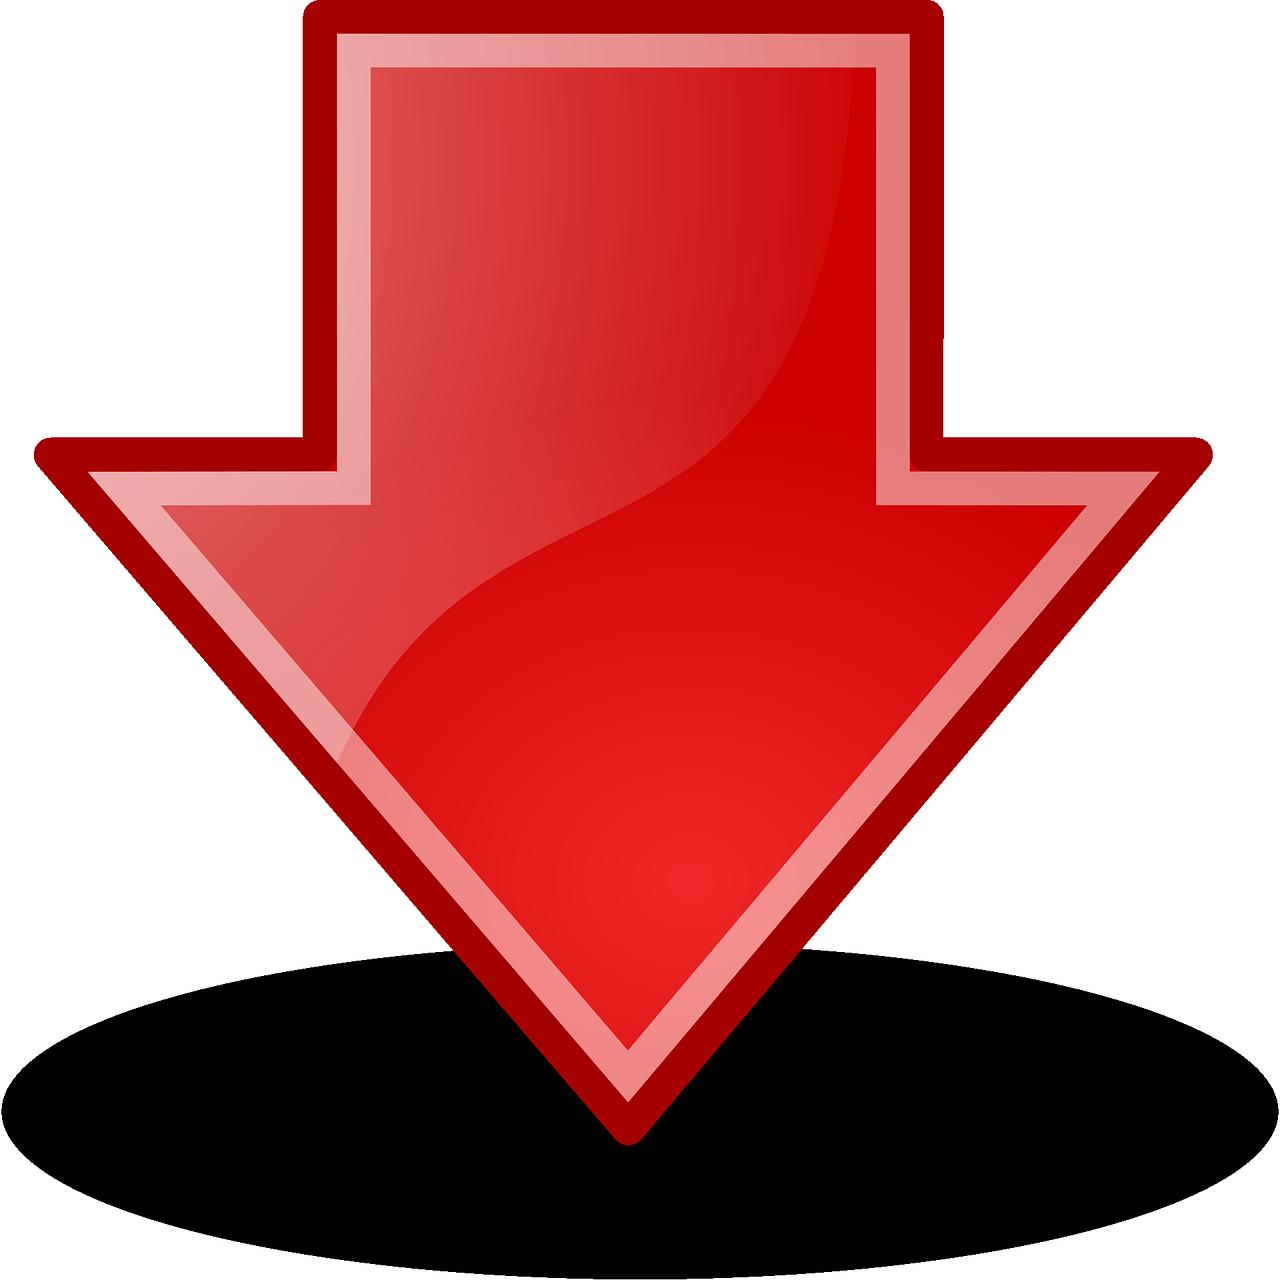 arrows-147745_1280.png